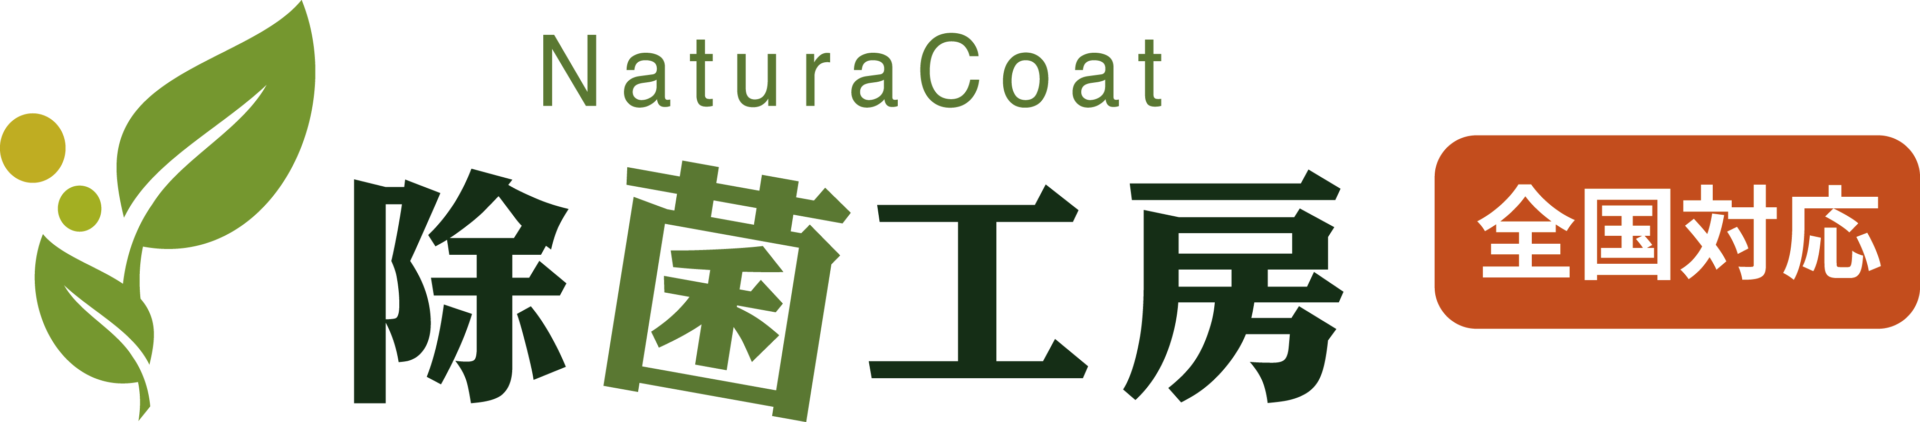 header_vc_logo_smartphone